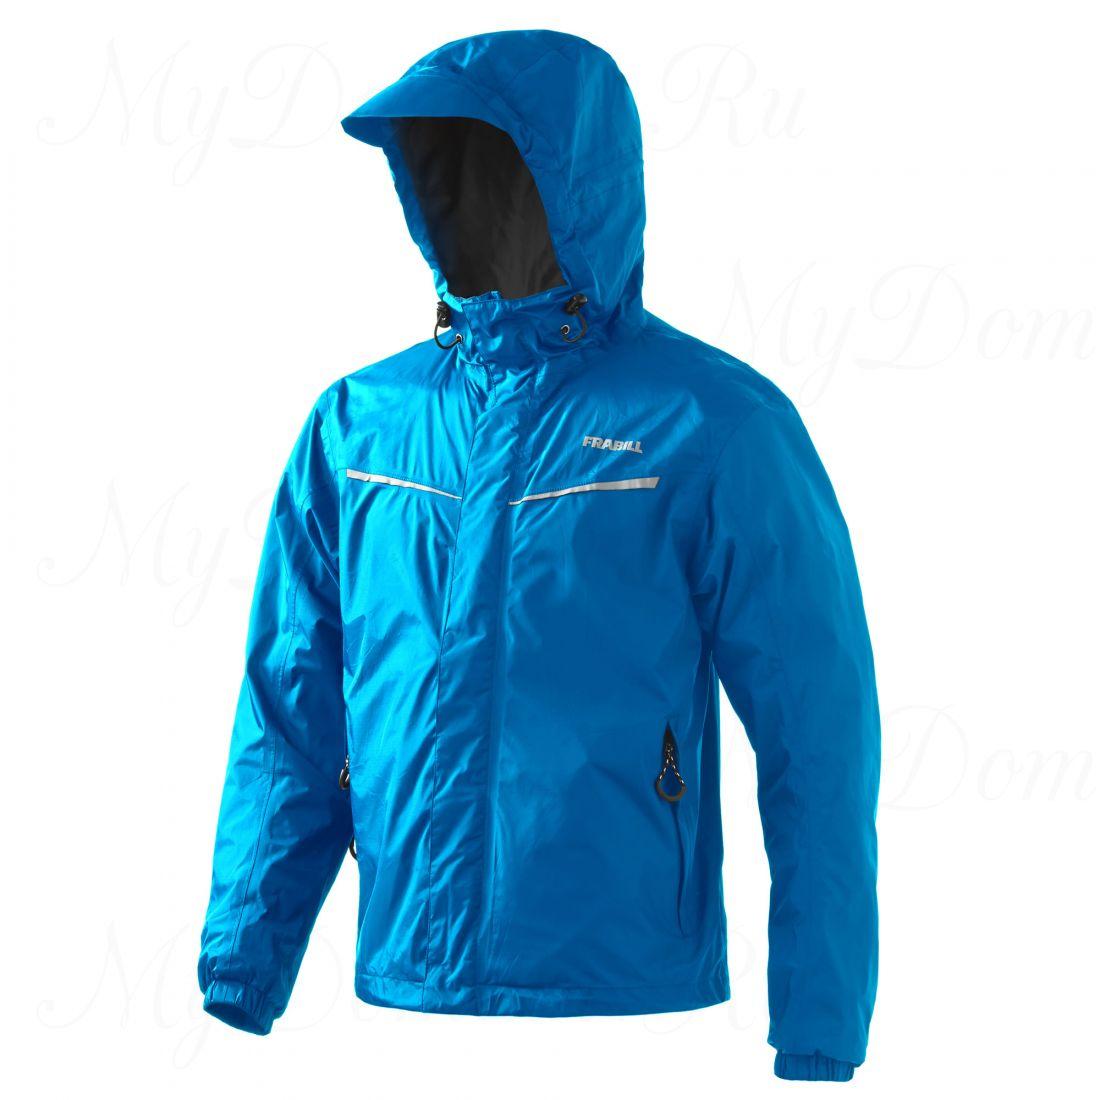 Куртка штормовая FRABILL Stow Jacket Costal Blue, р. L